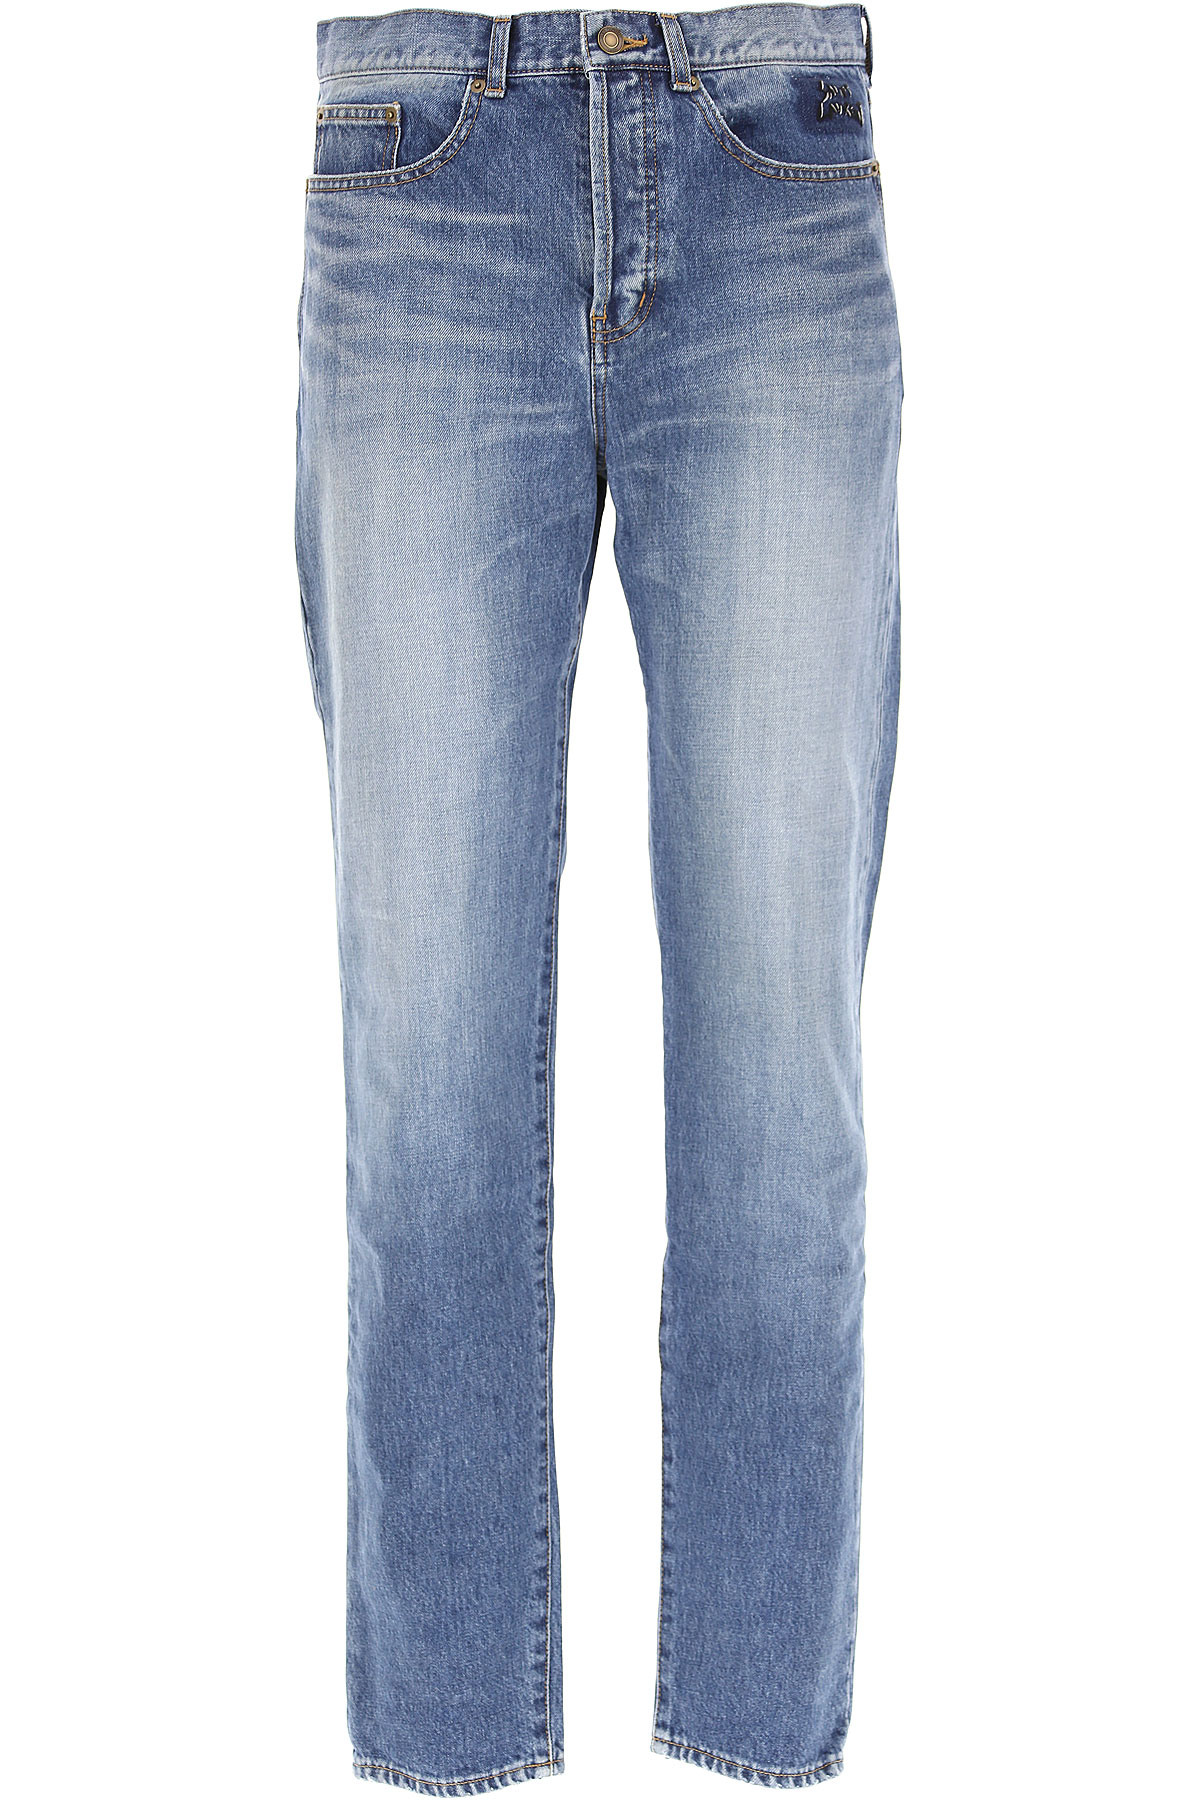 Yves Saint Laurent Jeans On Sale in Outlet, Denim, Cotton, 2017, 29 30 31 32 33